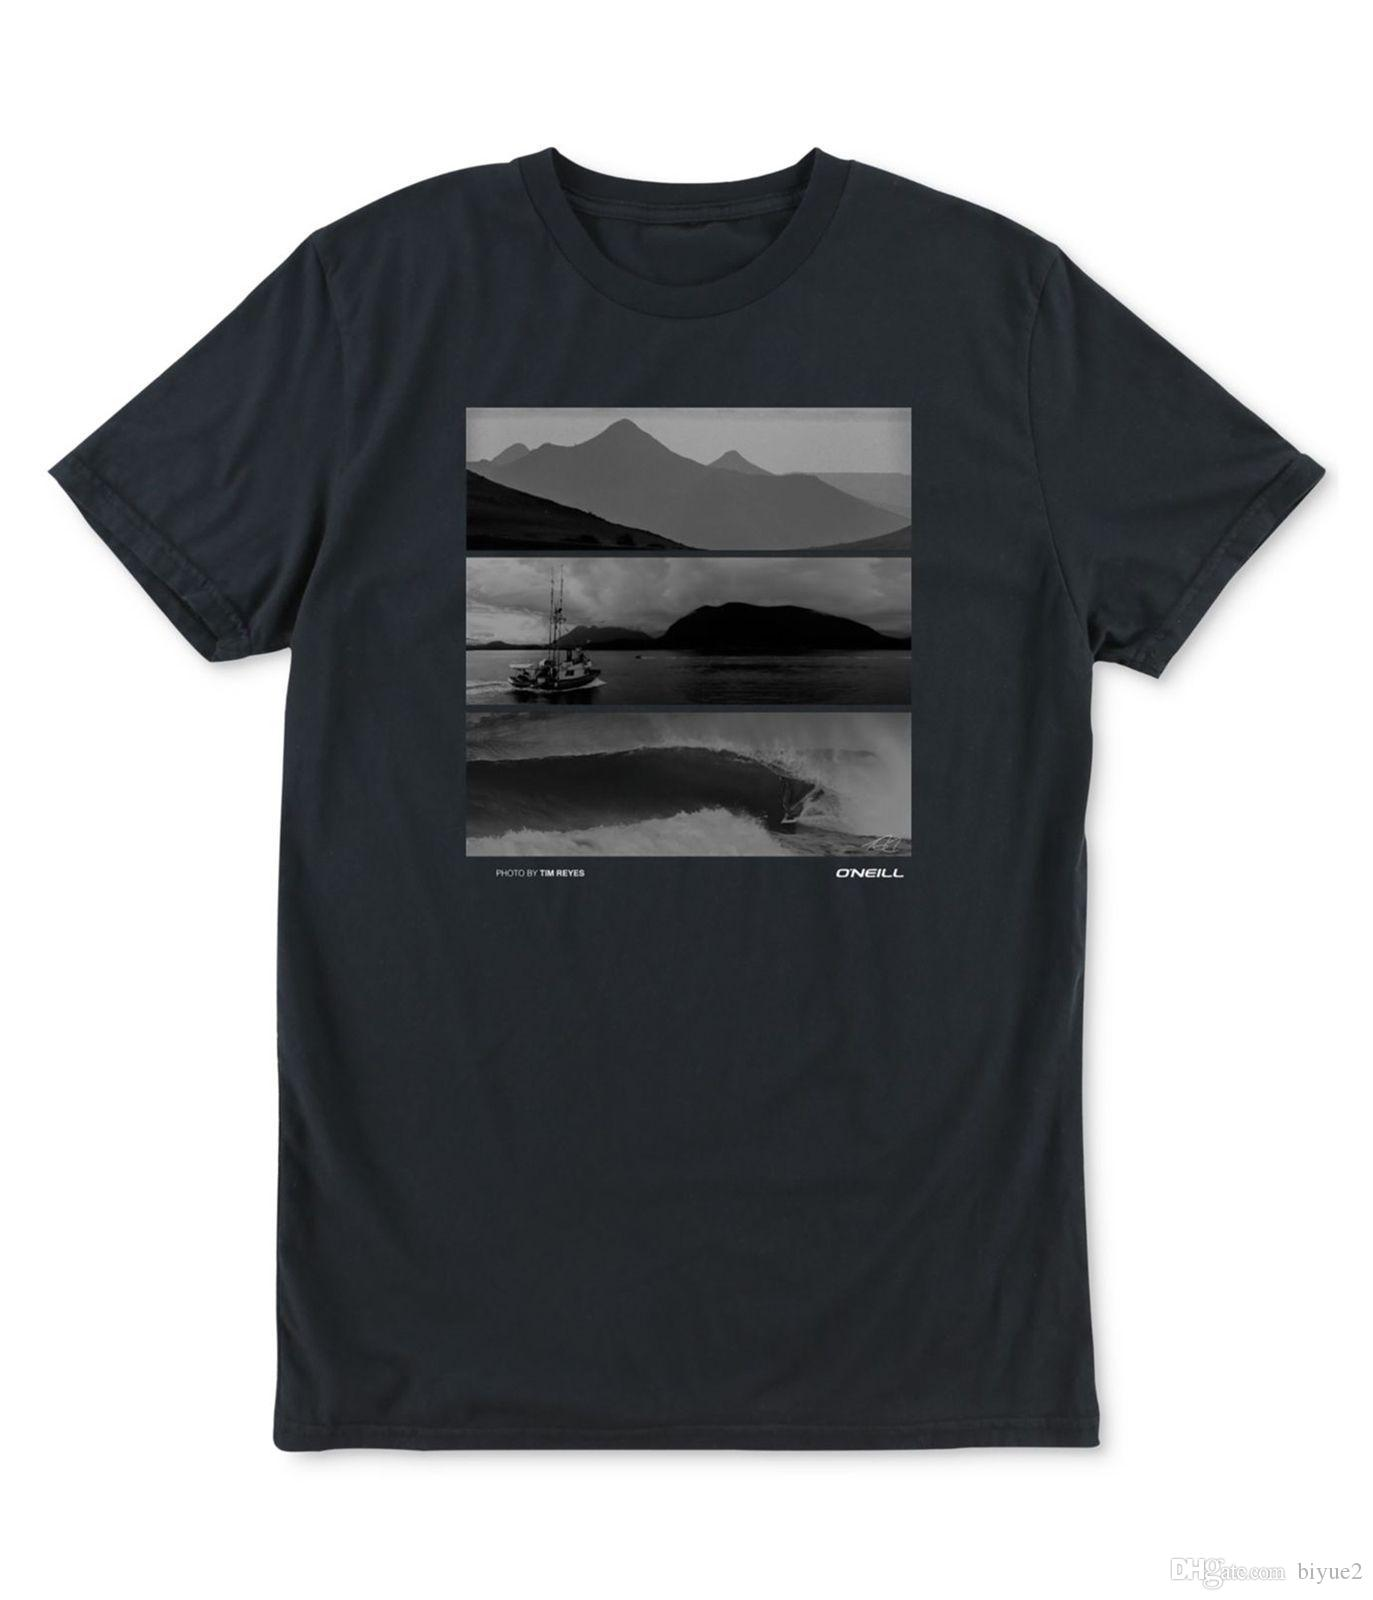 Blk Hombre Sabores Con Camiseta De O'neill Gráfico Para S FcuTlKJ13